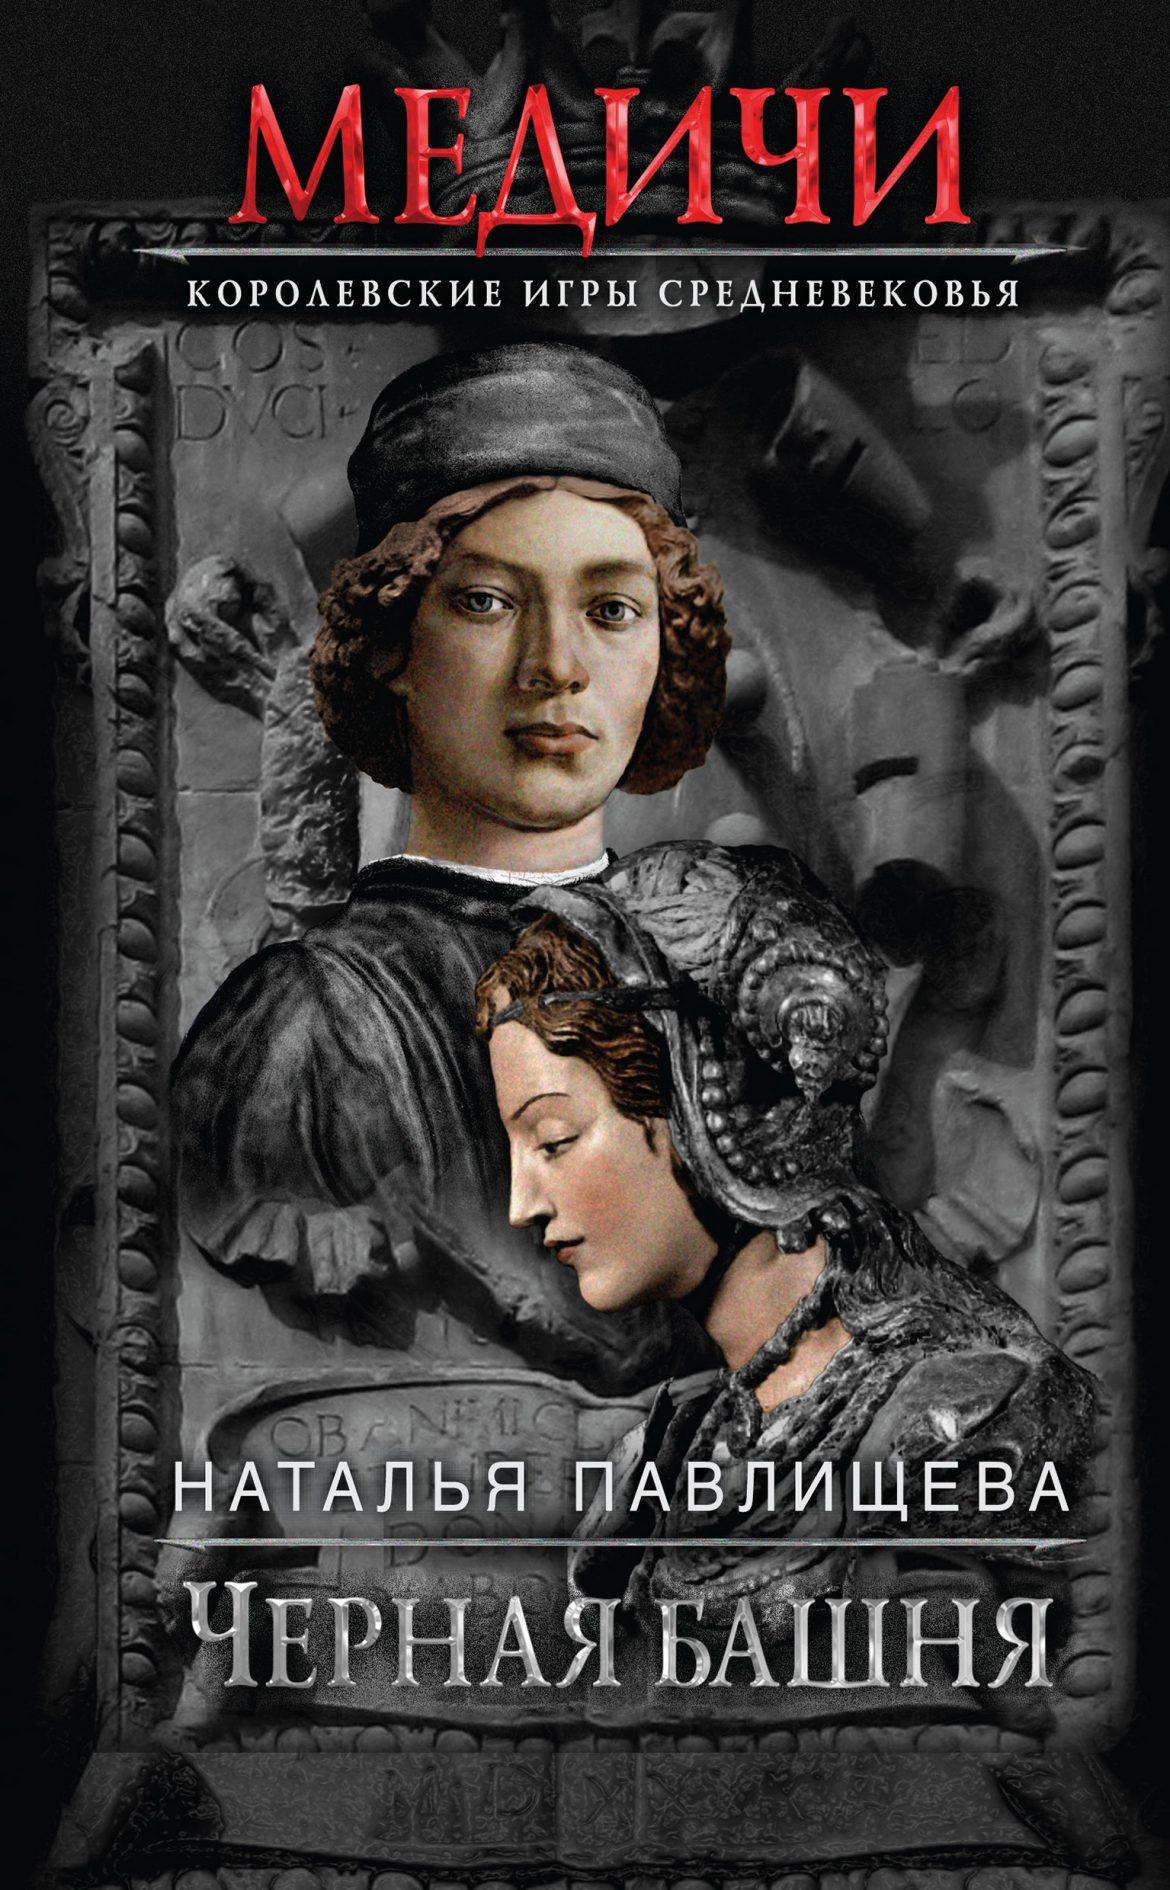 Черная башня —  Наталья Павлищева